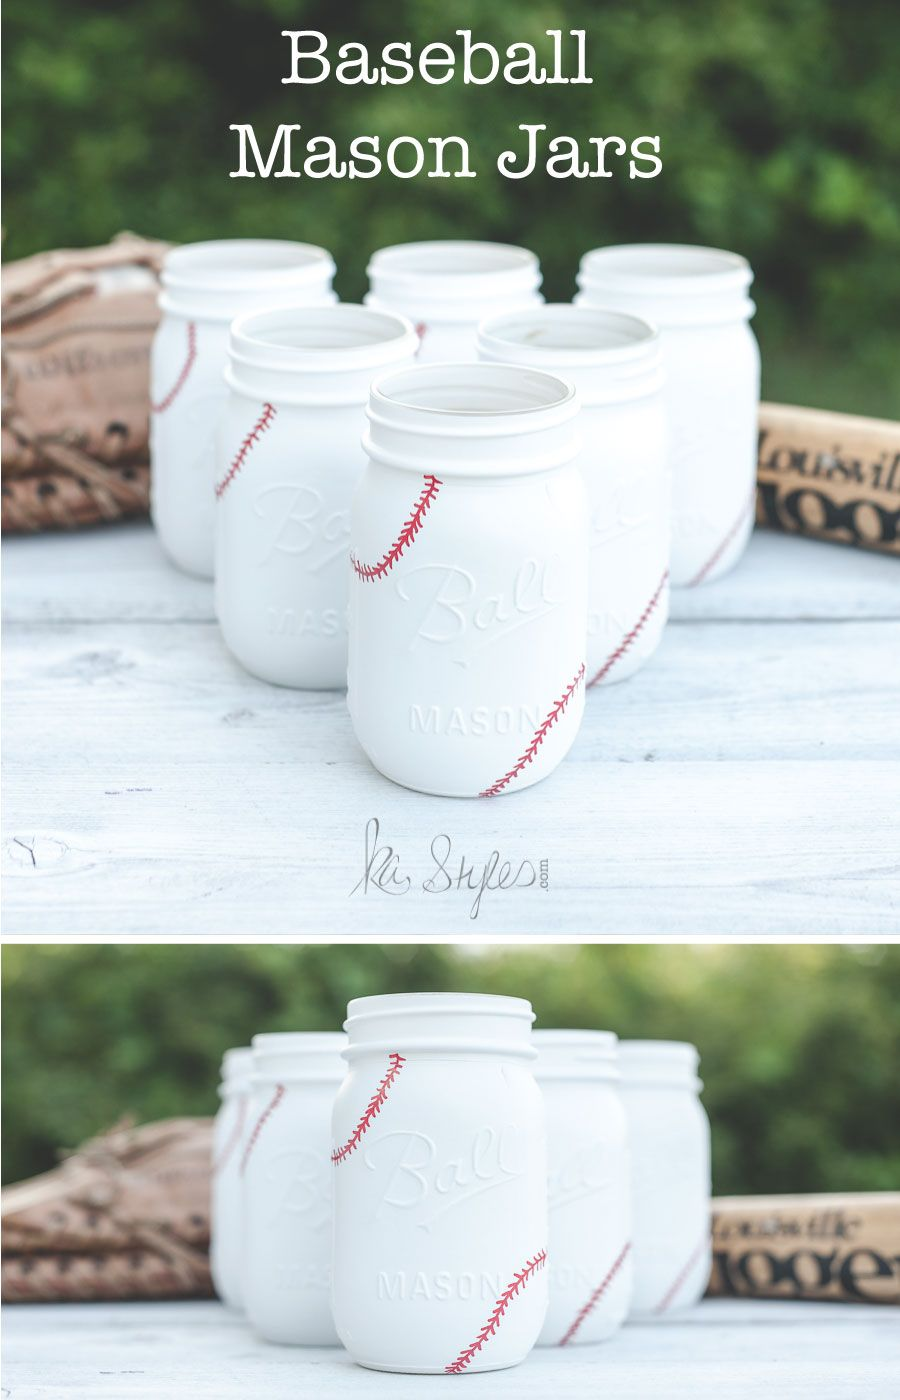 More baseball mason jars graduation gabe pinterest boda